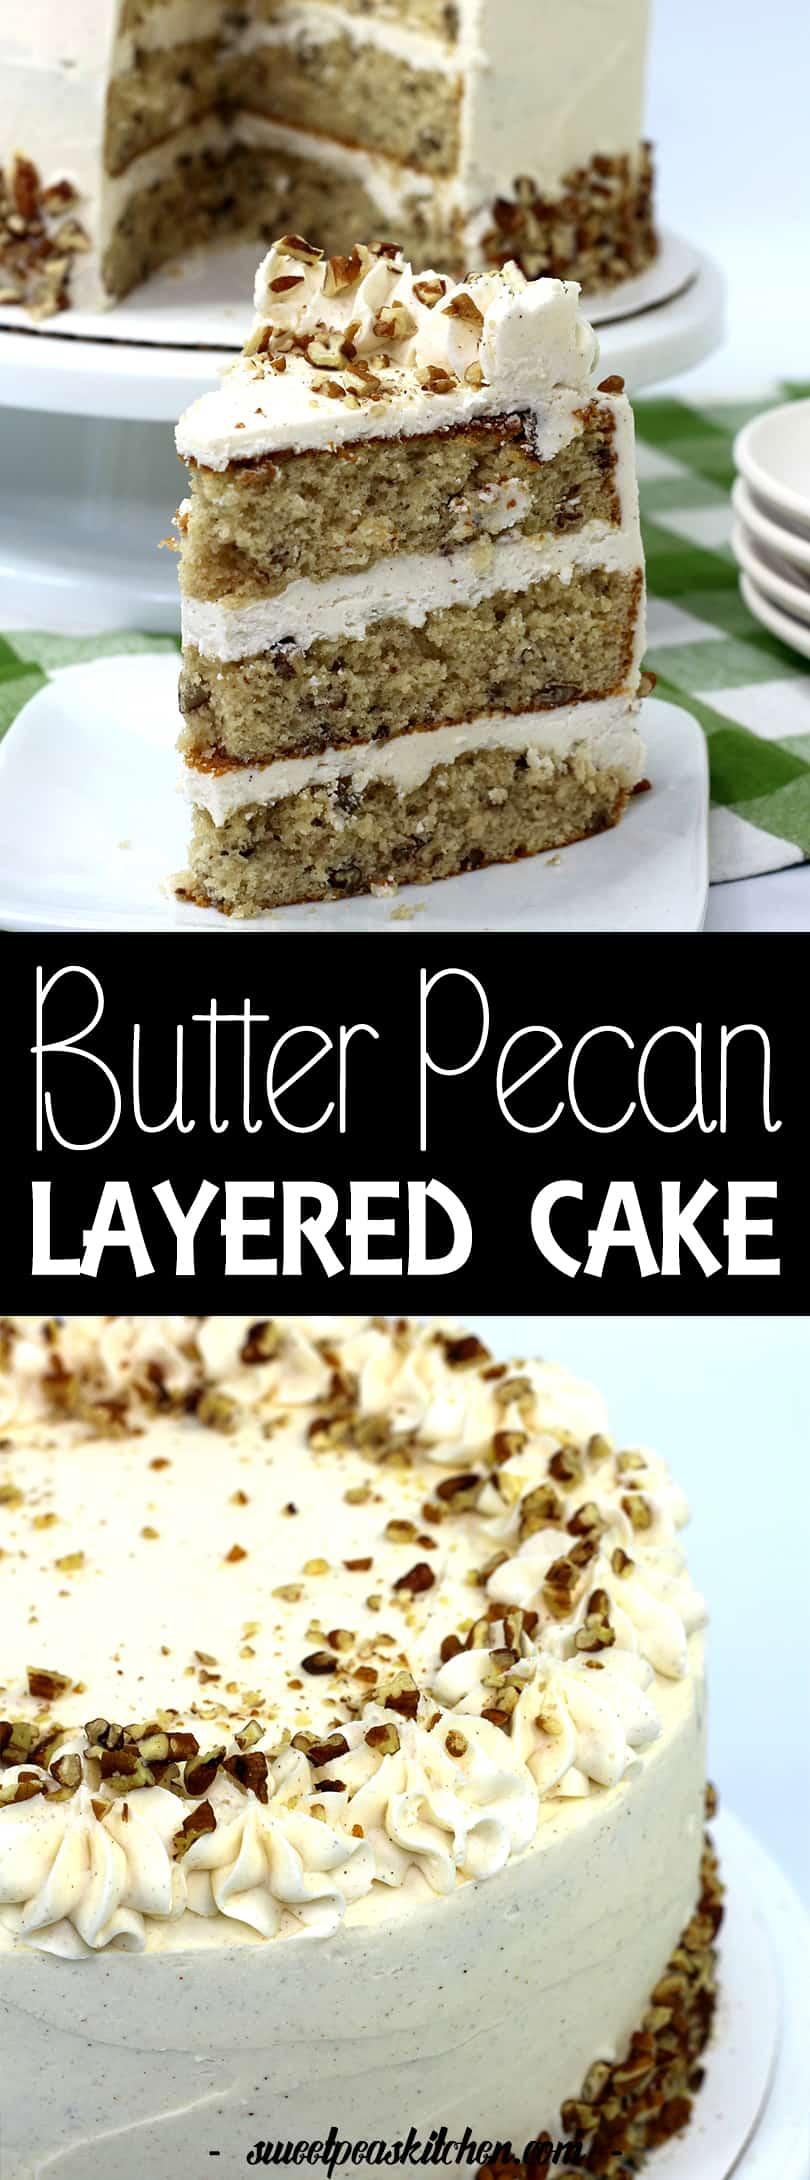 Layered Butter Pecan Cake Recipe